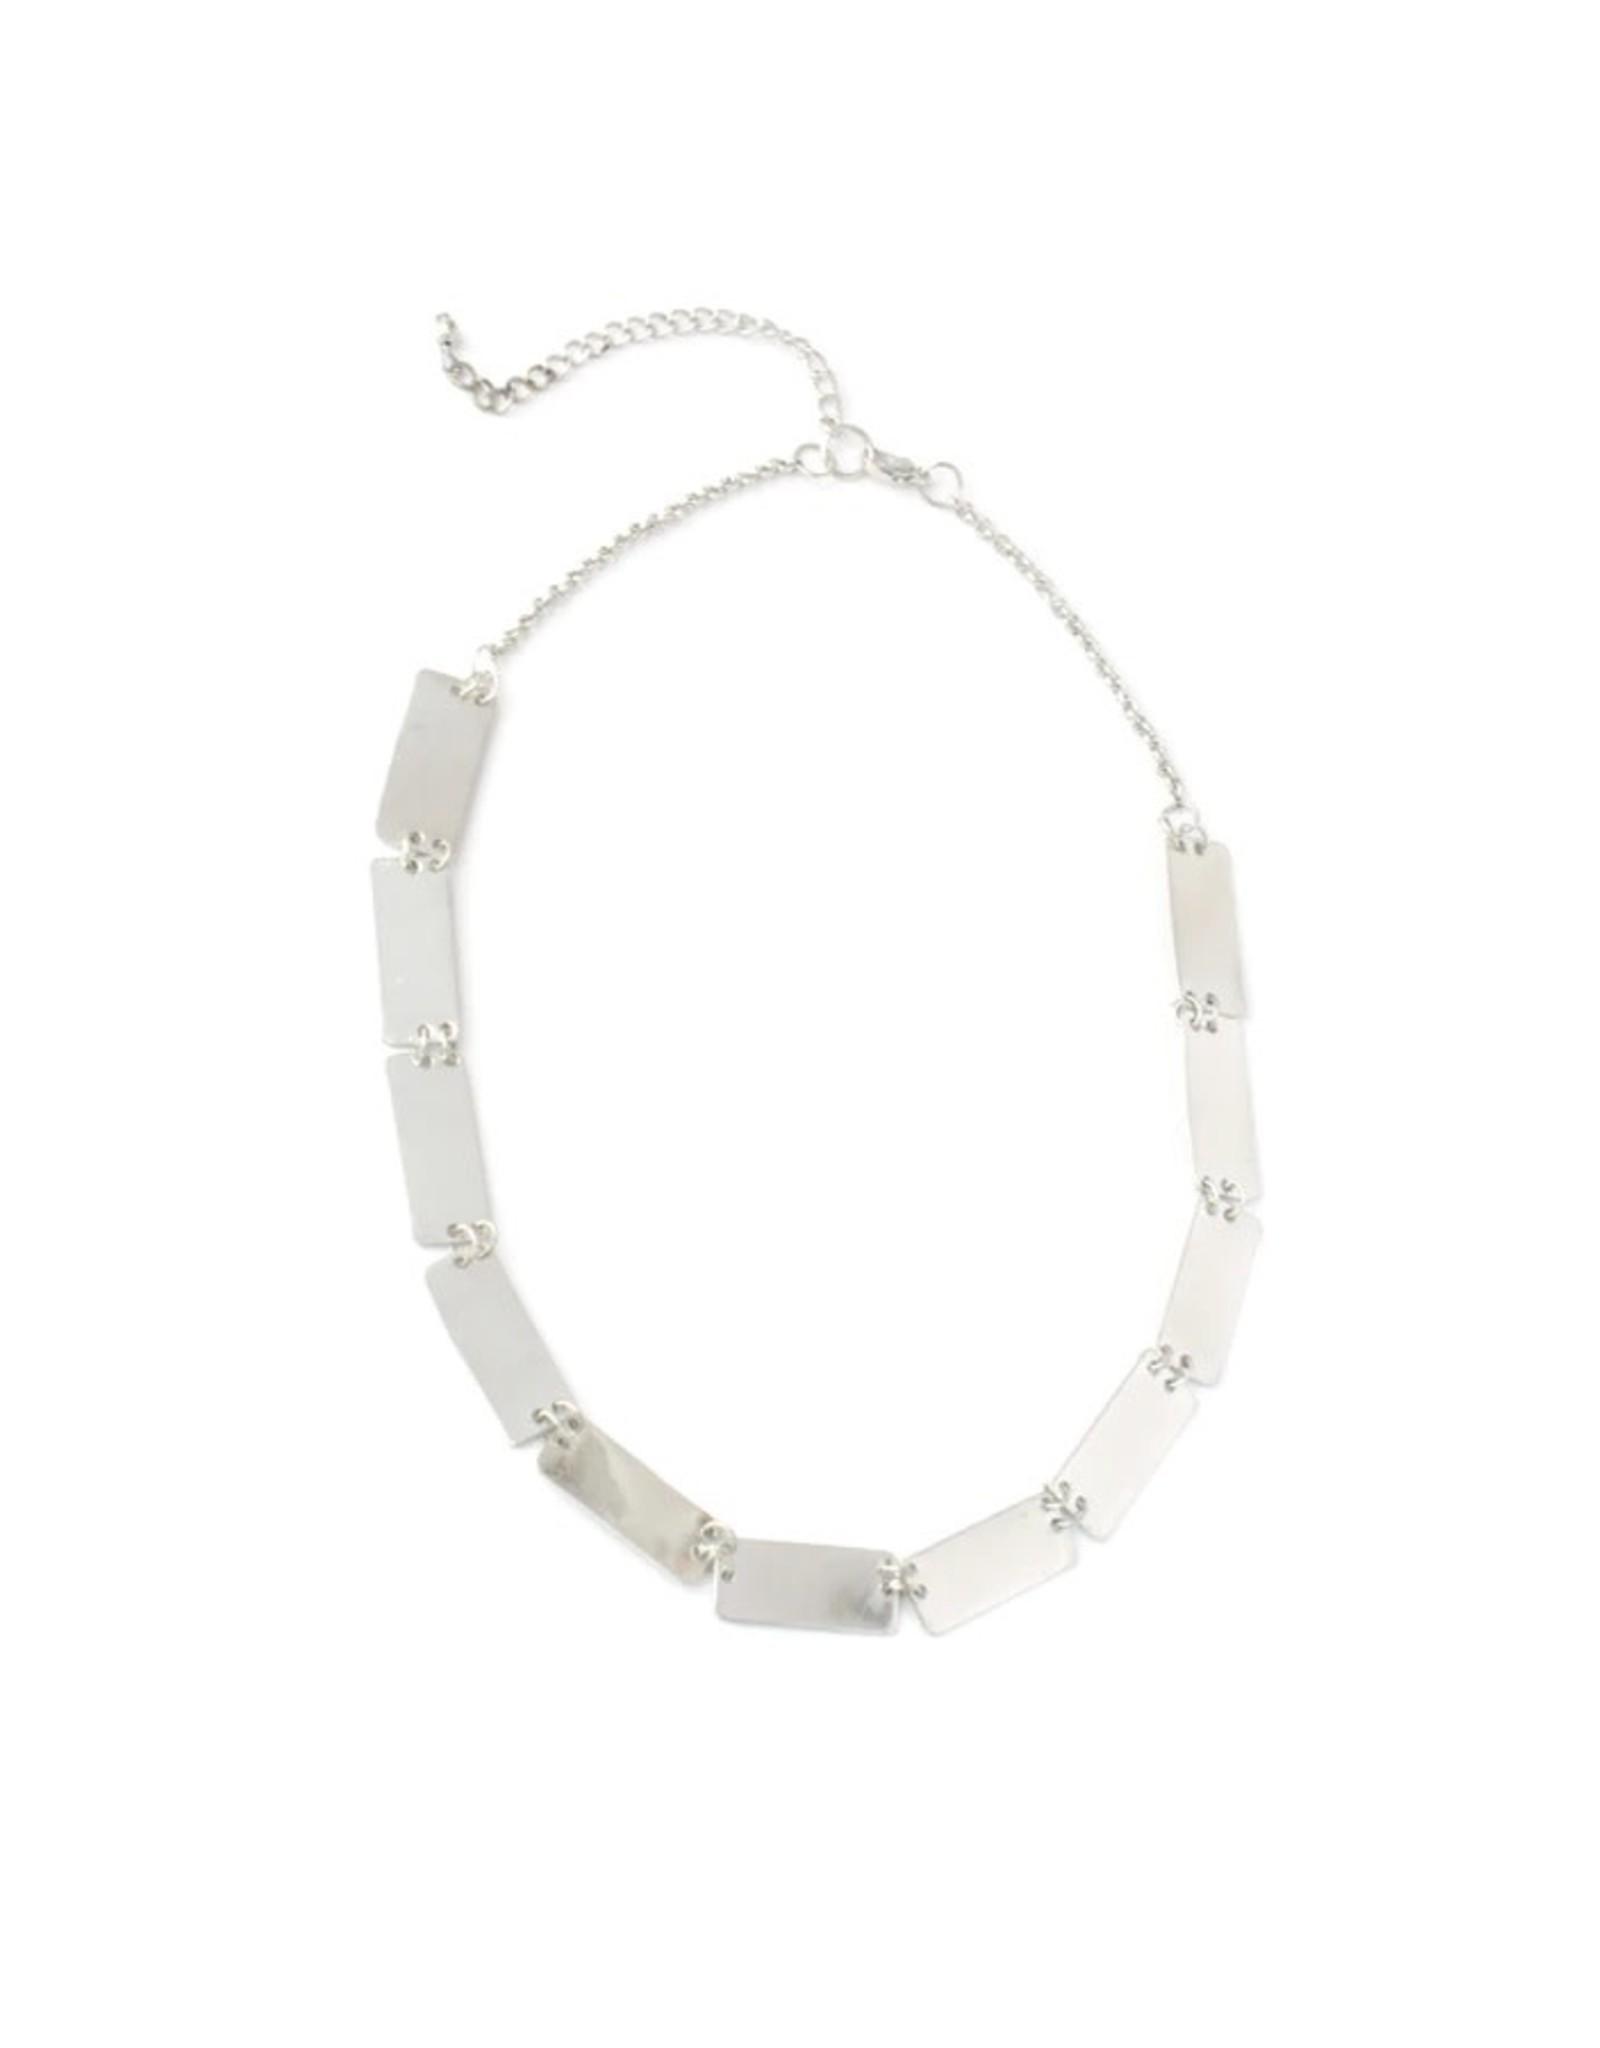 Fair Anita Pretty Pathways Necklace, Silver